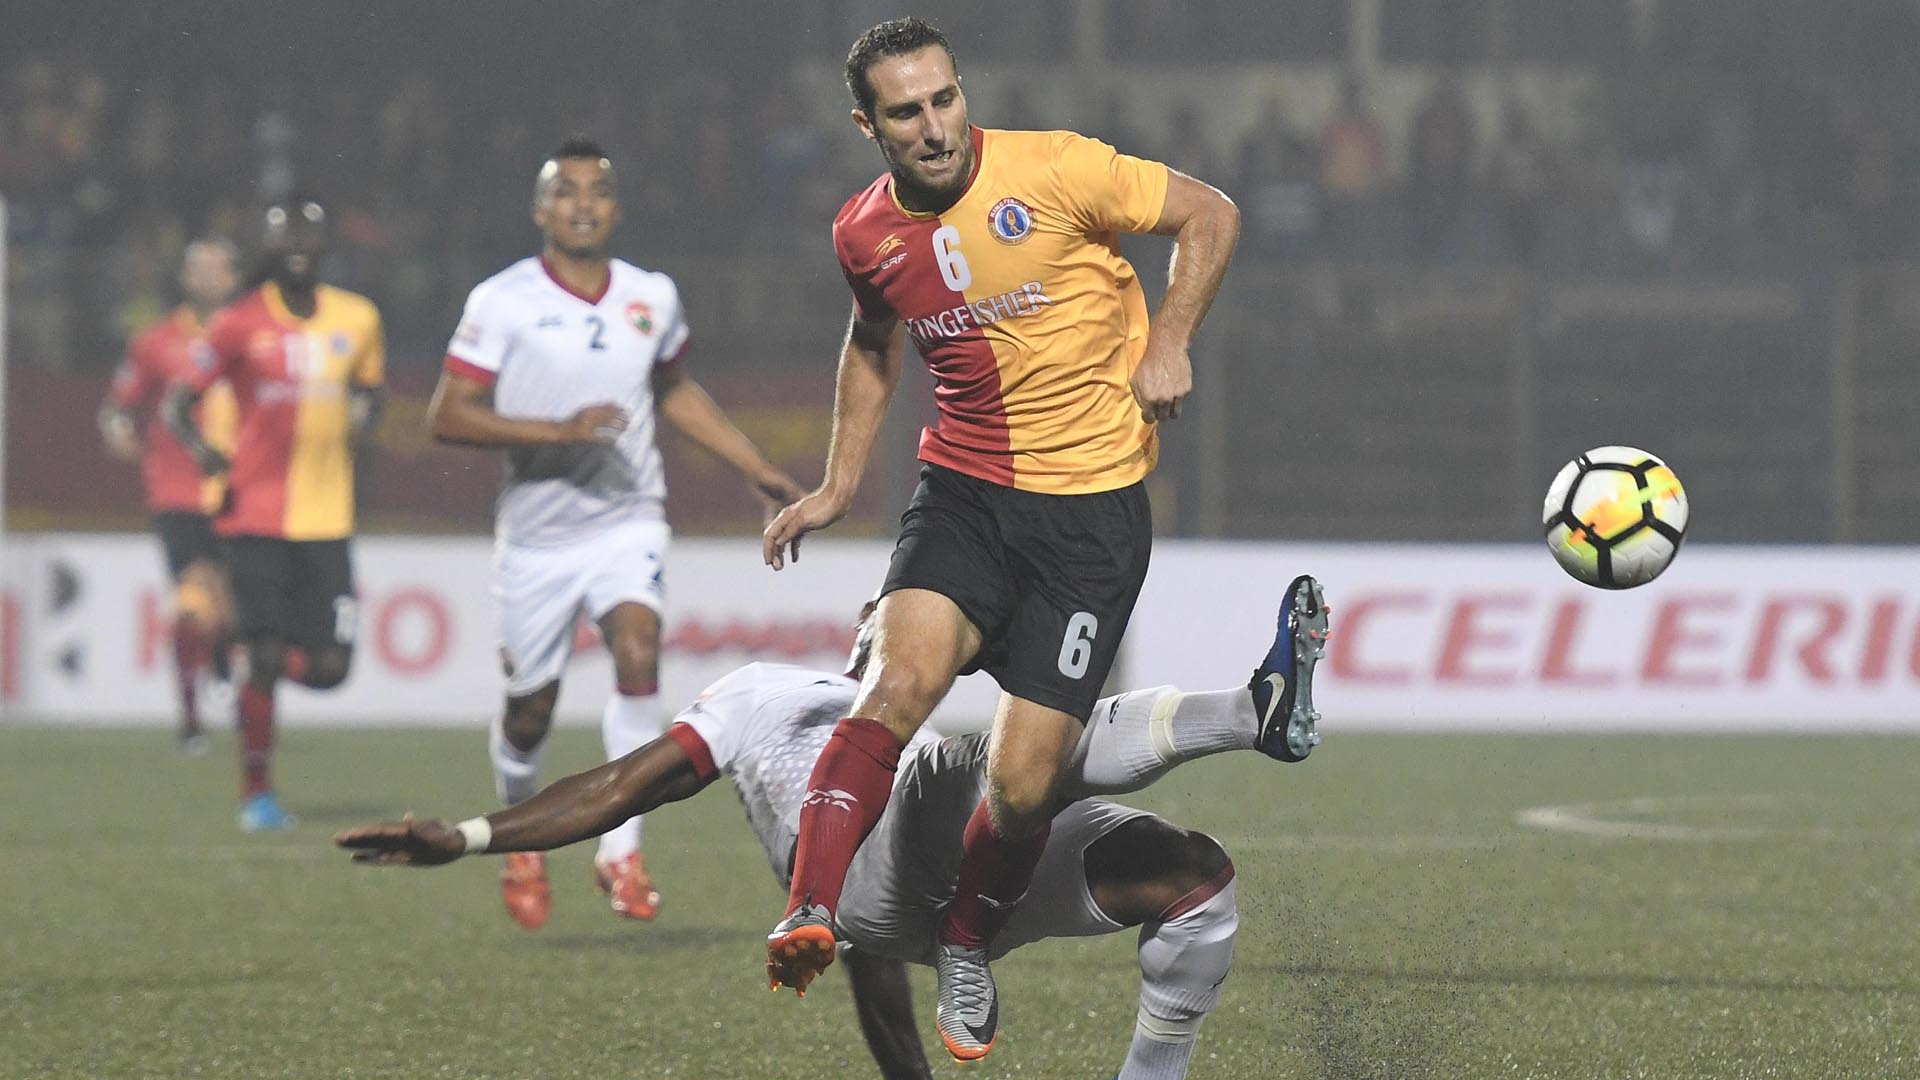 Mahmoud-al-amna-east-bengal-shillong-lajong-fc-i-league-20172018_1dd2y3rie458dzorjj6st8skj